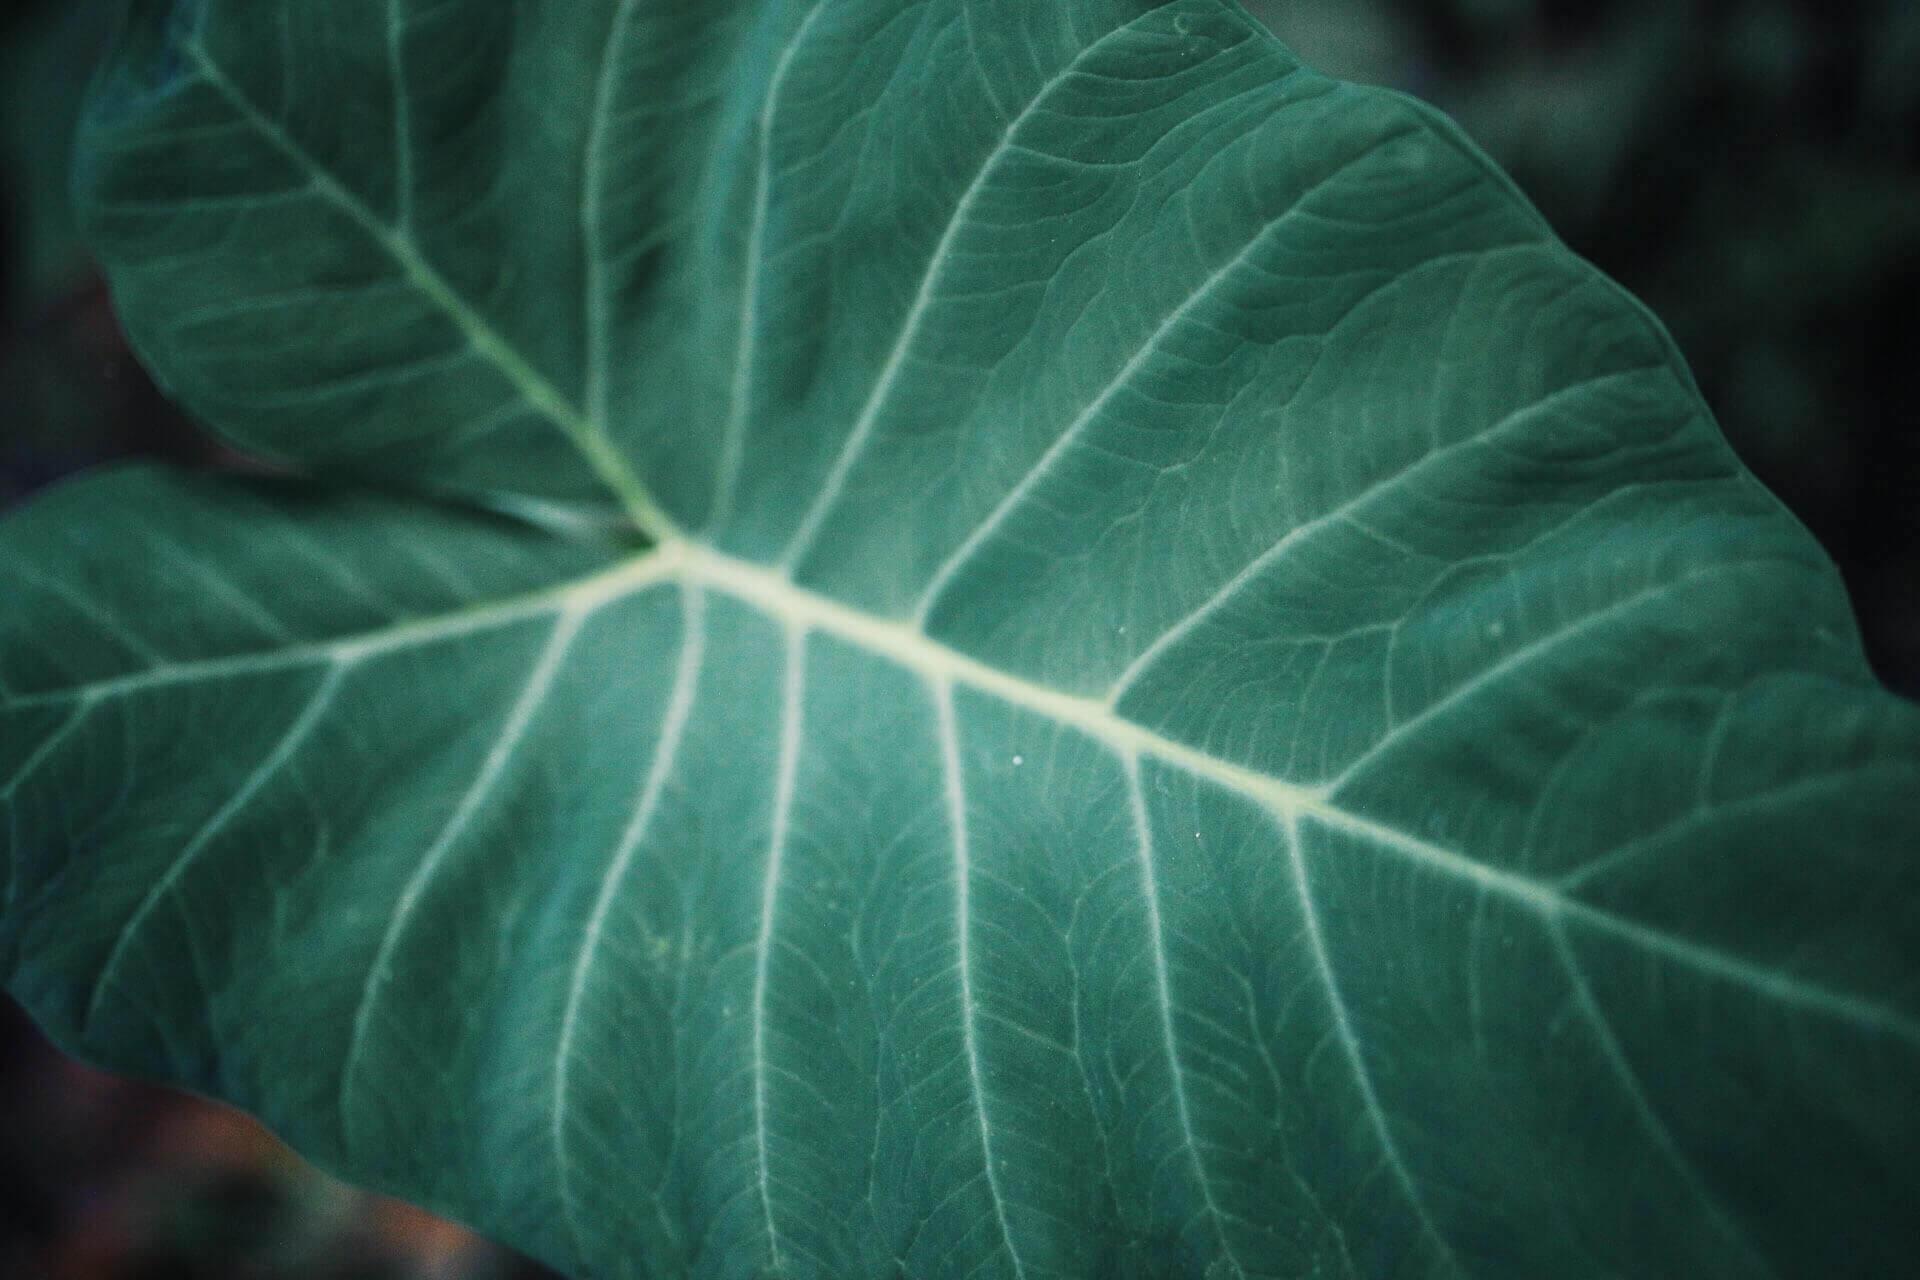 Hoja verde fotografiada en Bali